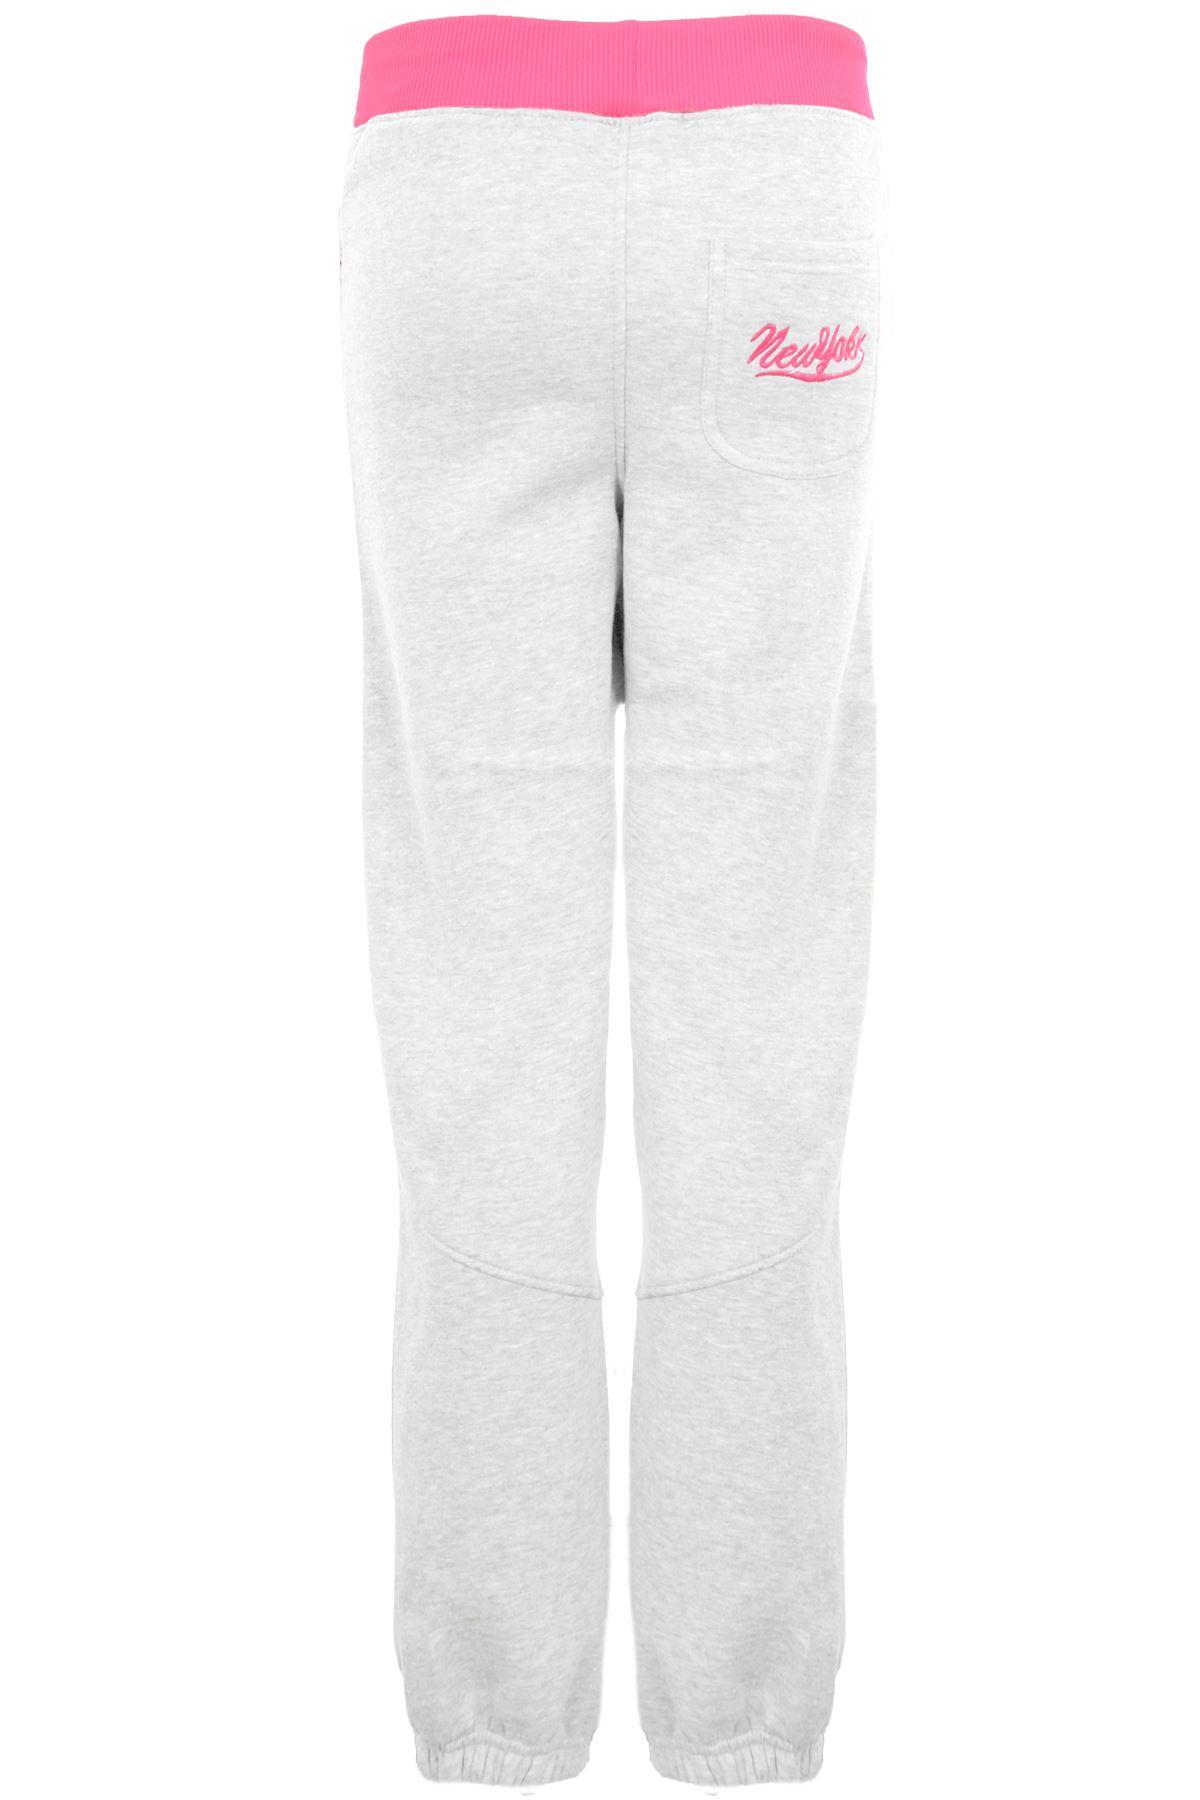 Women/'s Fuchsia New York Stretch Shiny Ladies Casual Jogging Bottom Trousers